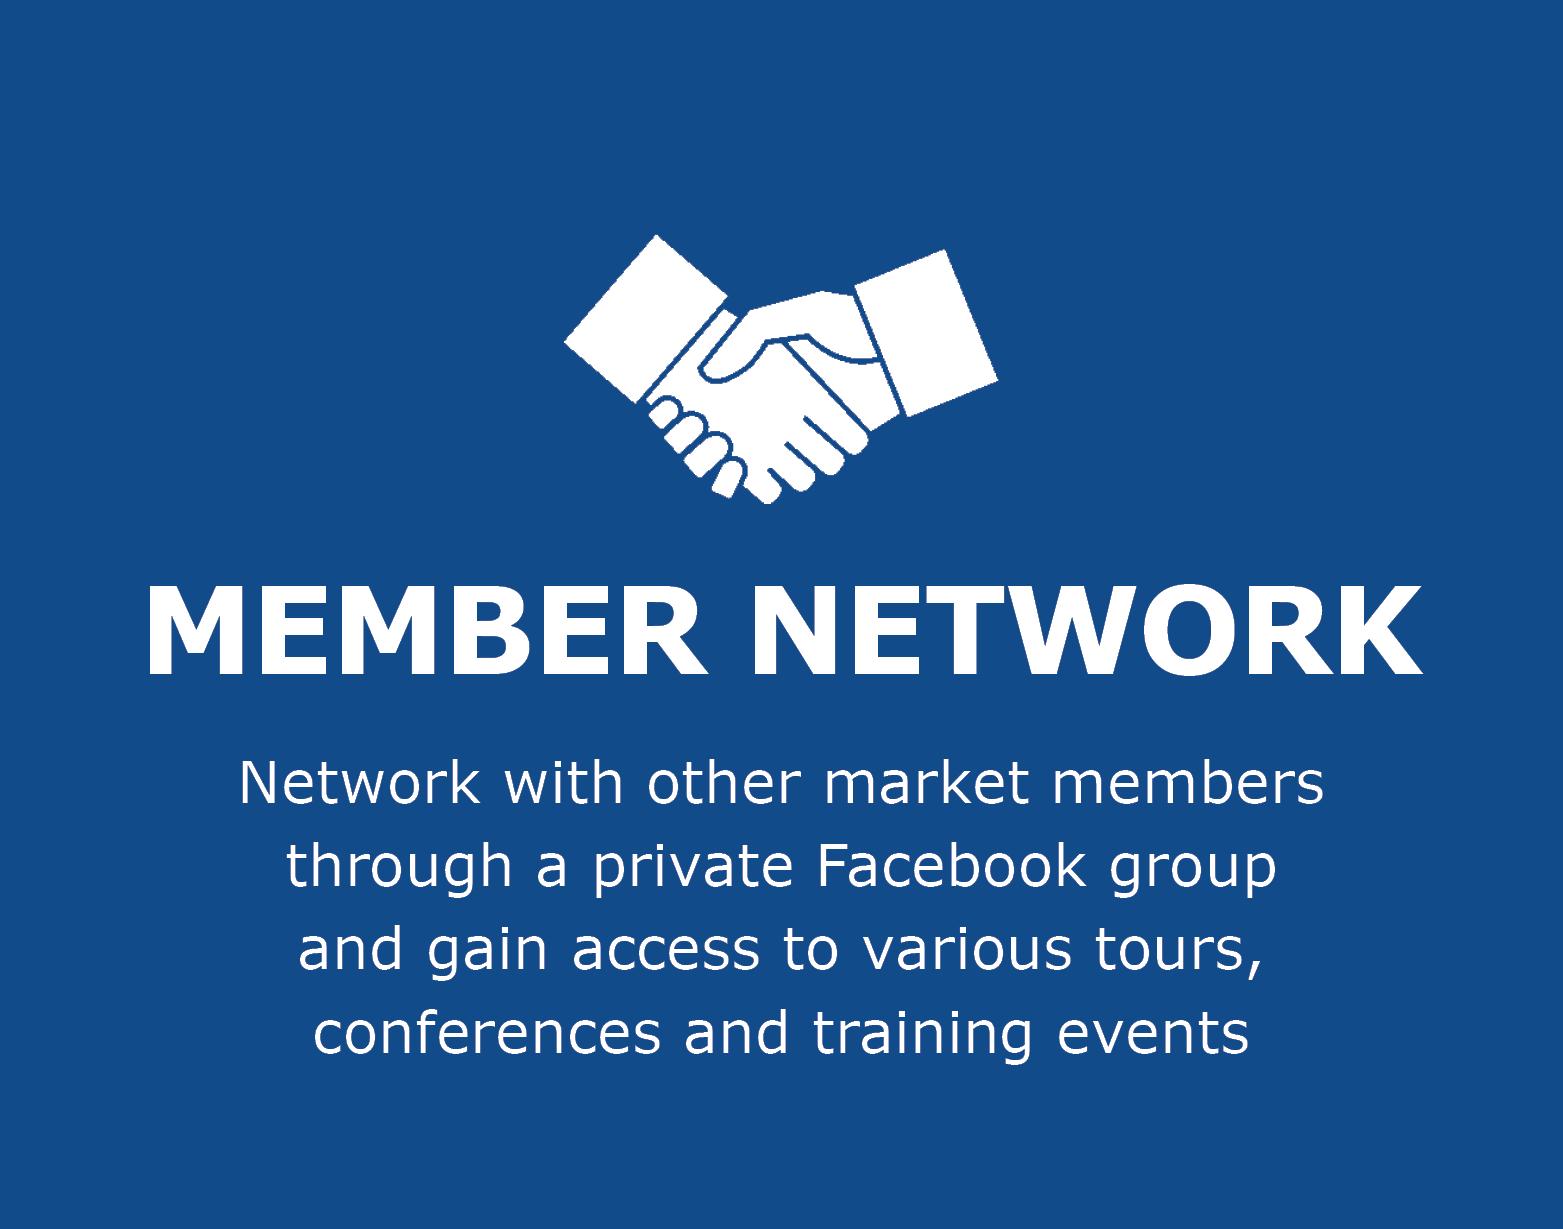 Members Network